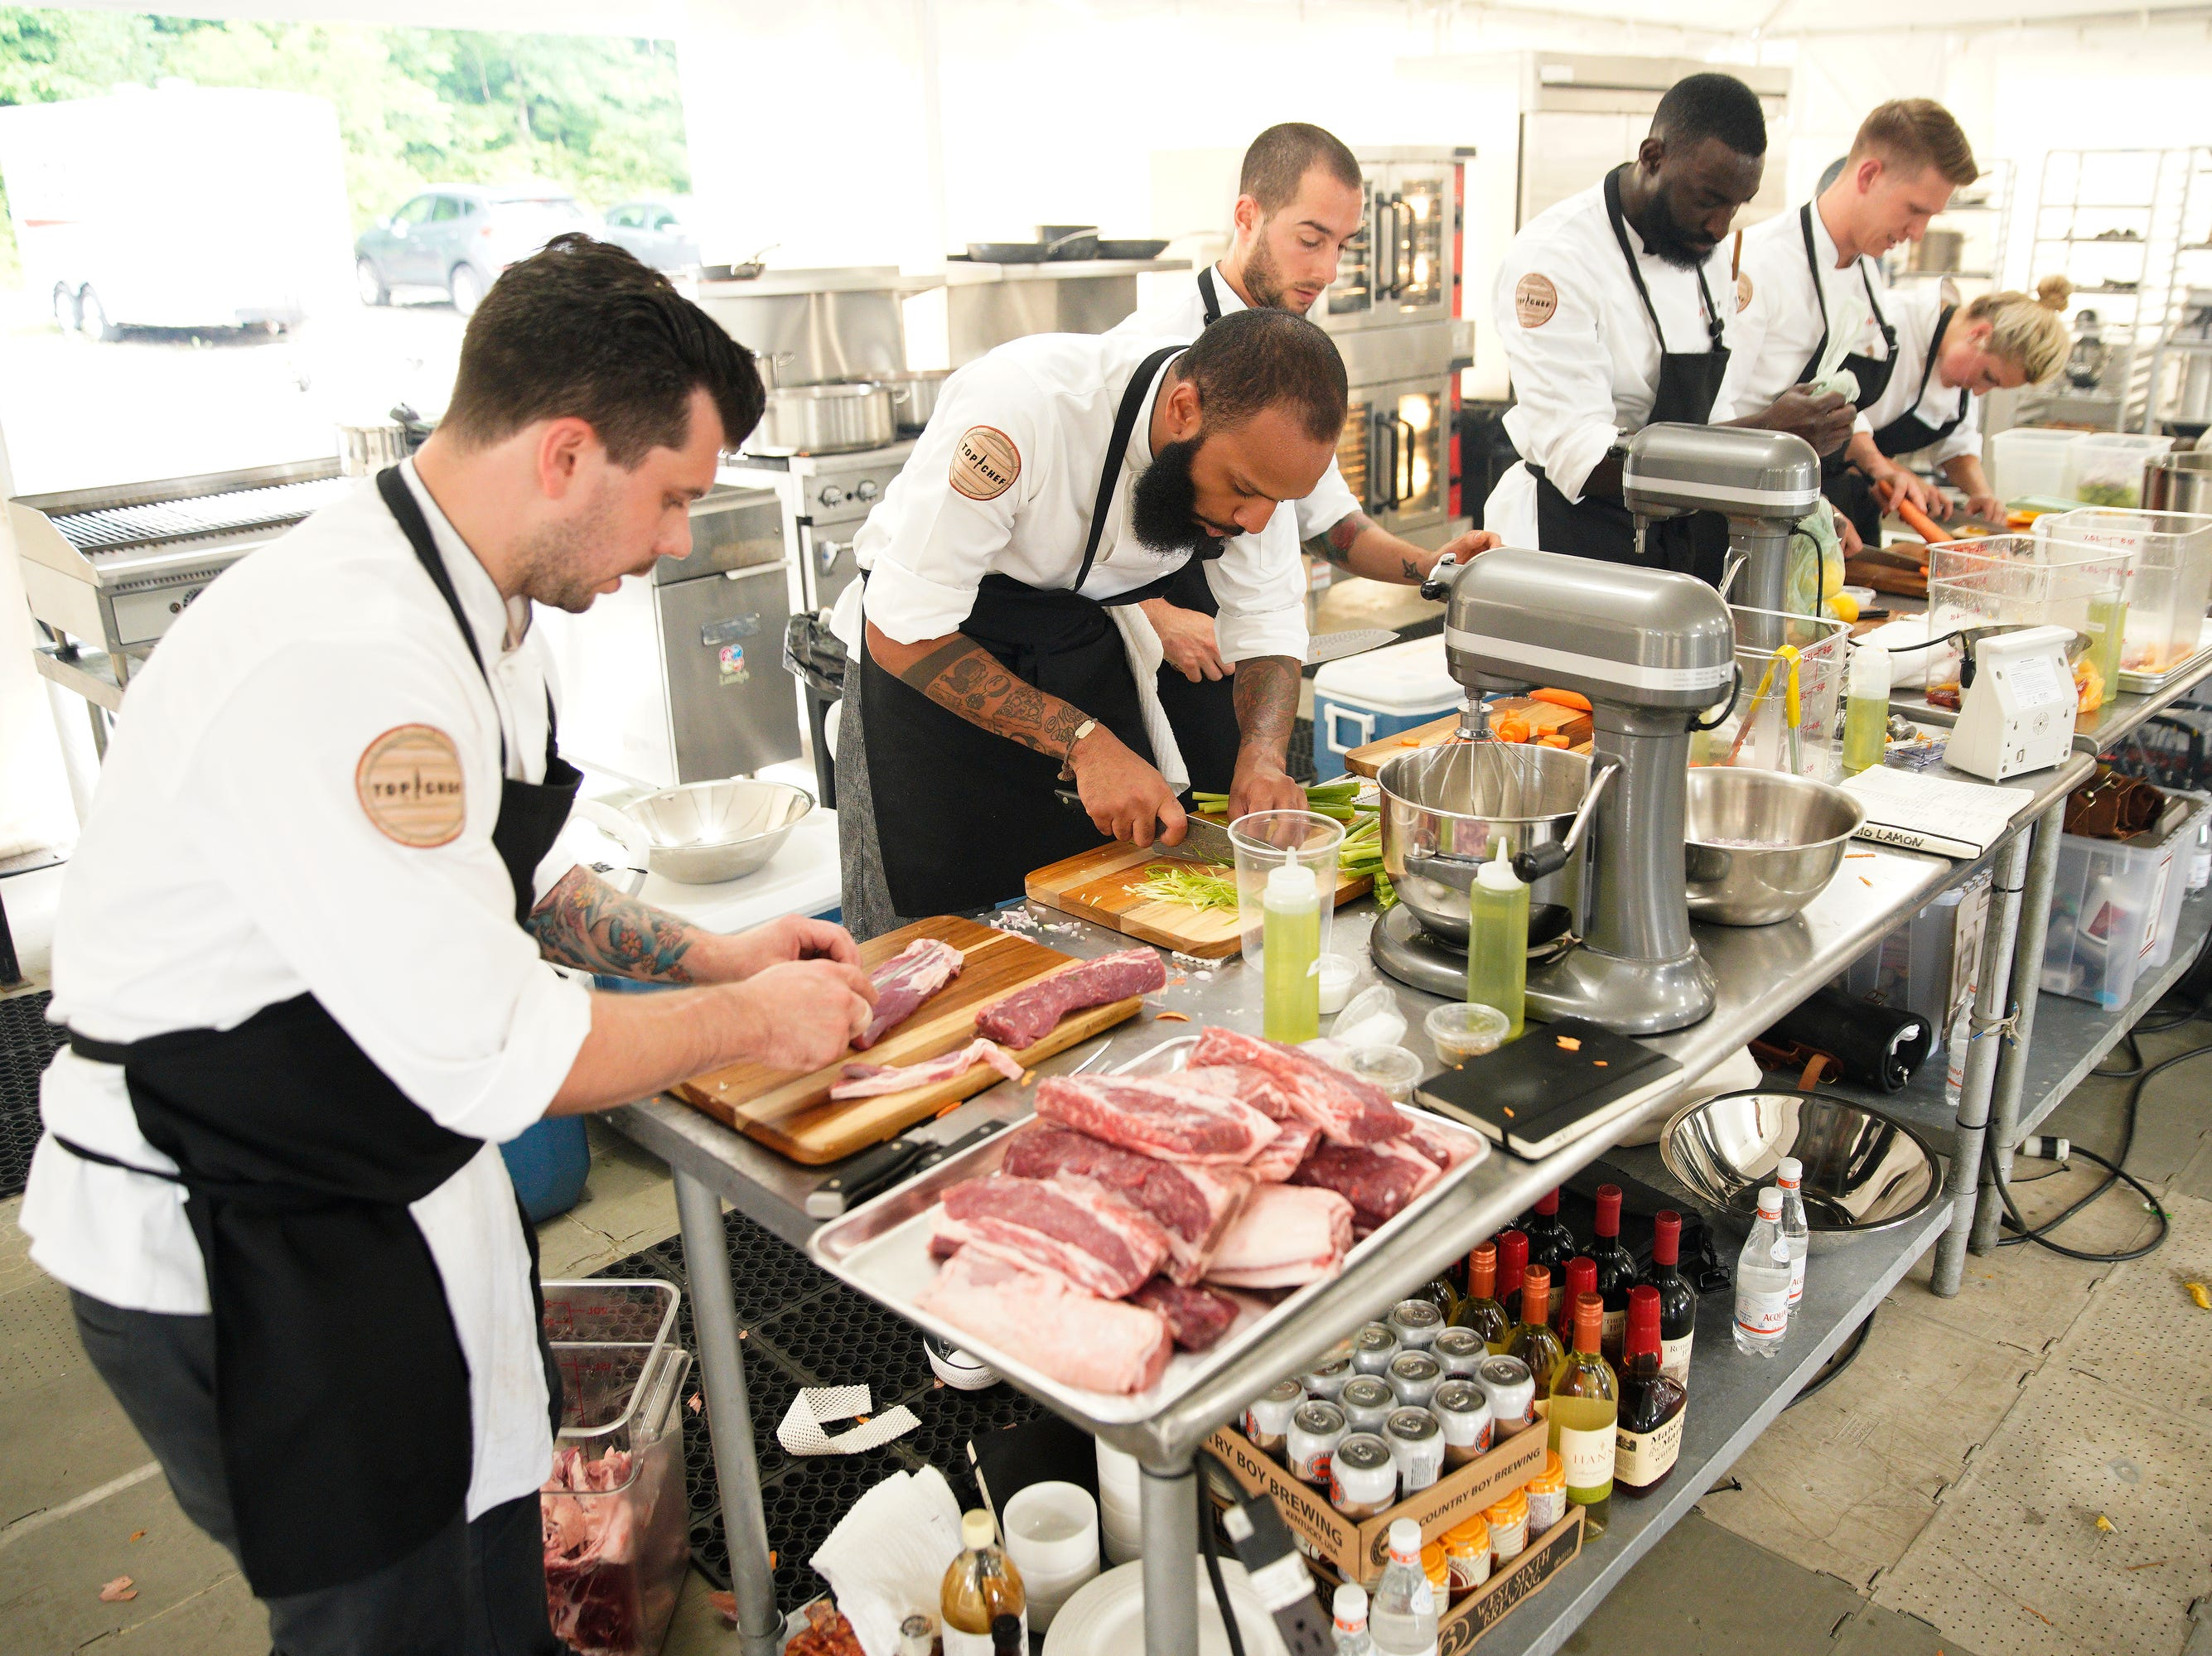 """Top Chef"" contestants prepare for a challenge on episode 2 of season 16."